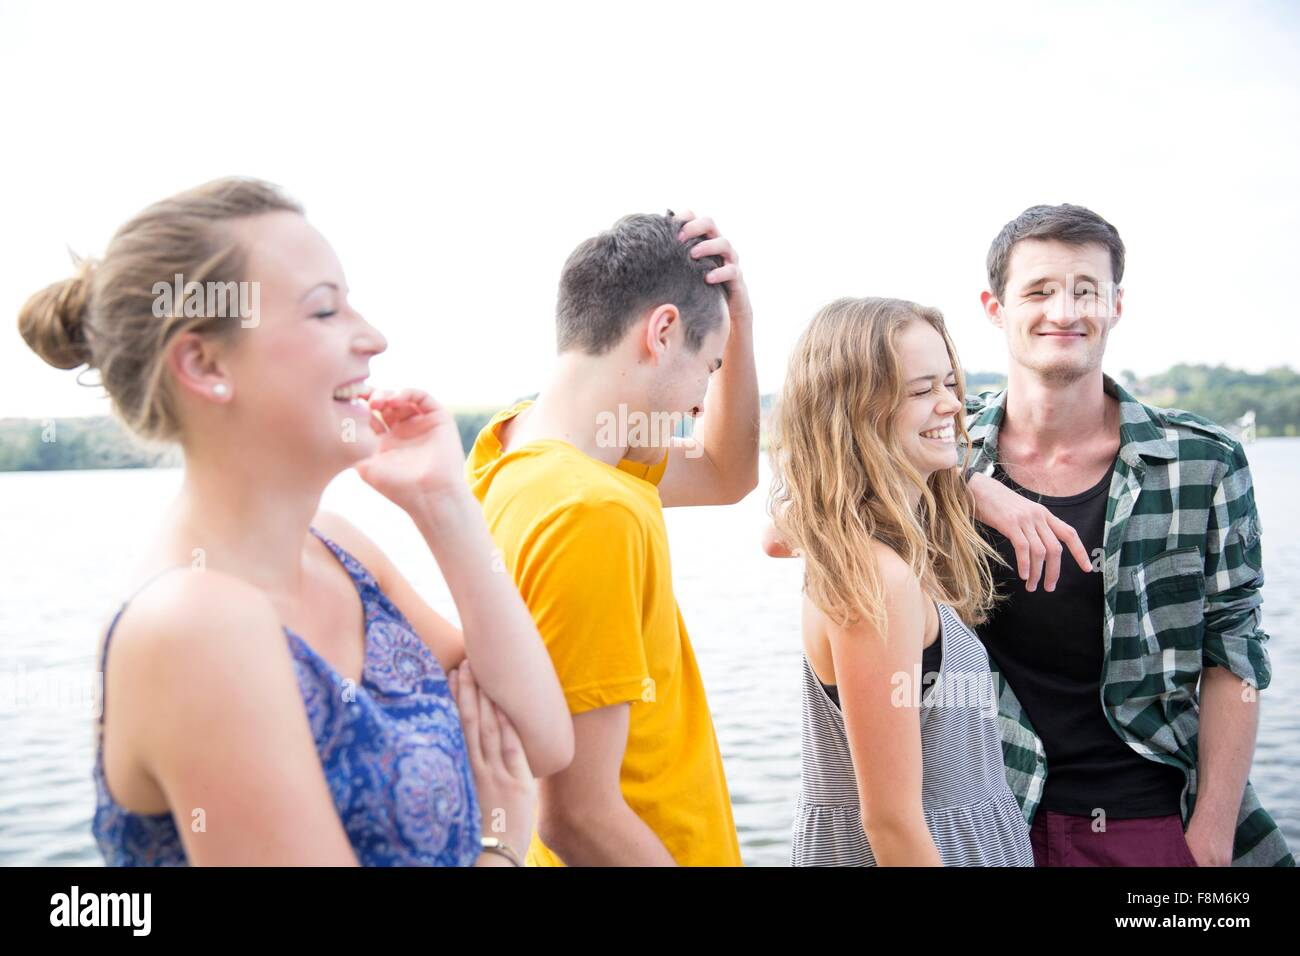 Gruppe junger Erwachsener, im Freien, lachen Stockbild